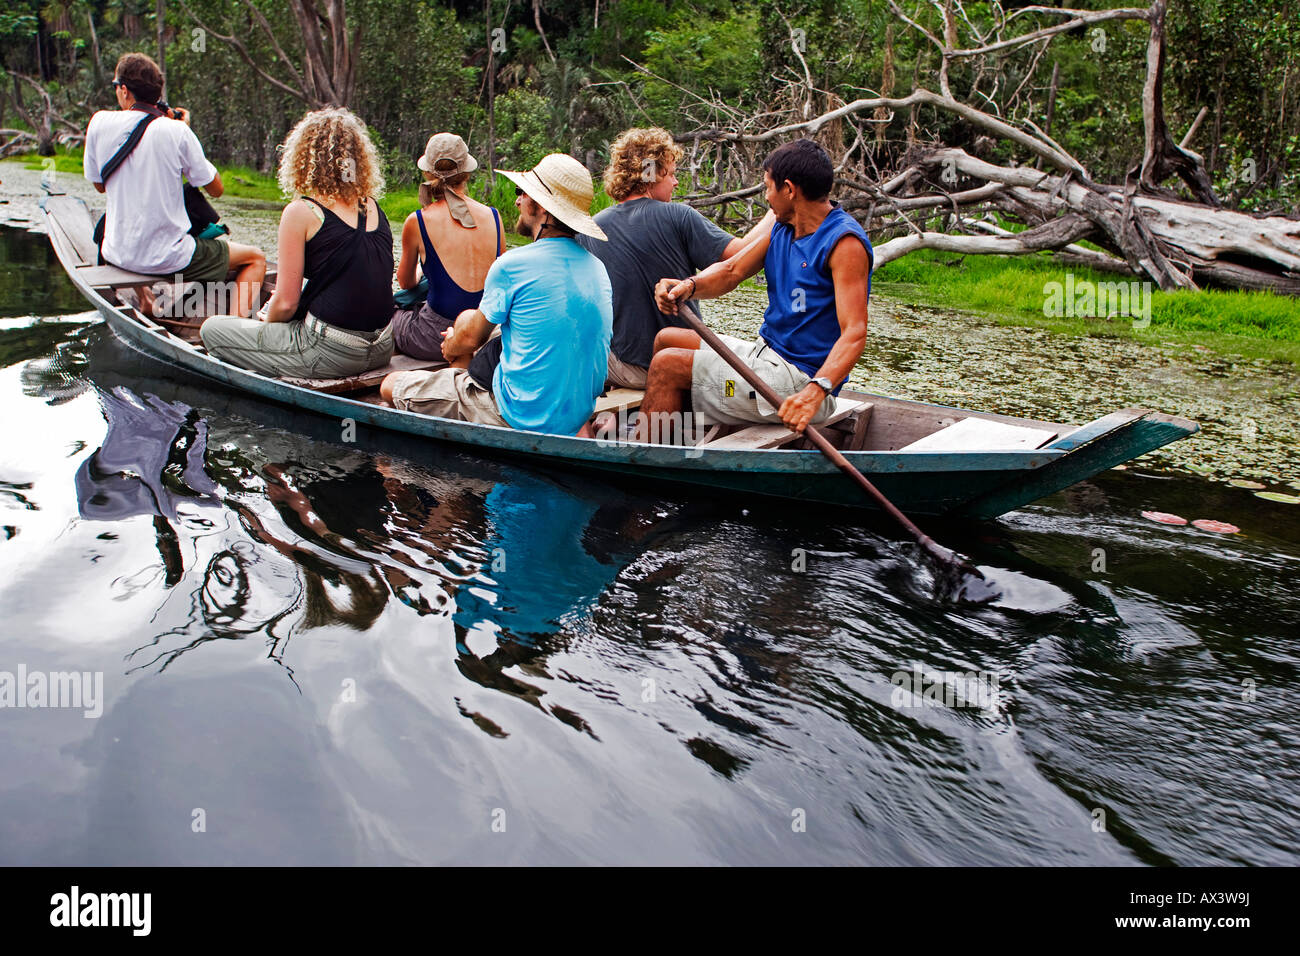 Brazil, Amazon, Rio Tapajos. A tributary of the Rio Tapajos which is itself a tributary of the Amazon. - Stock Image